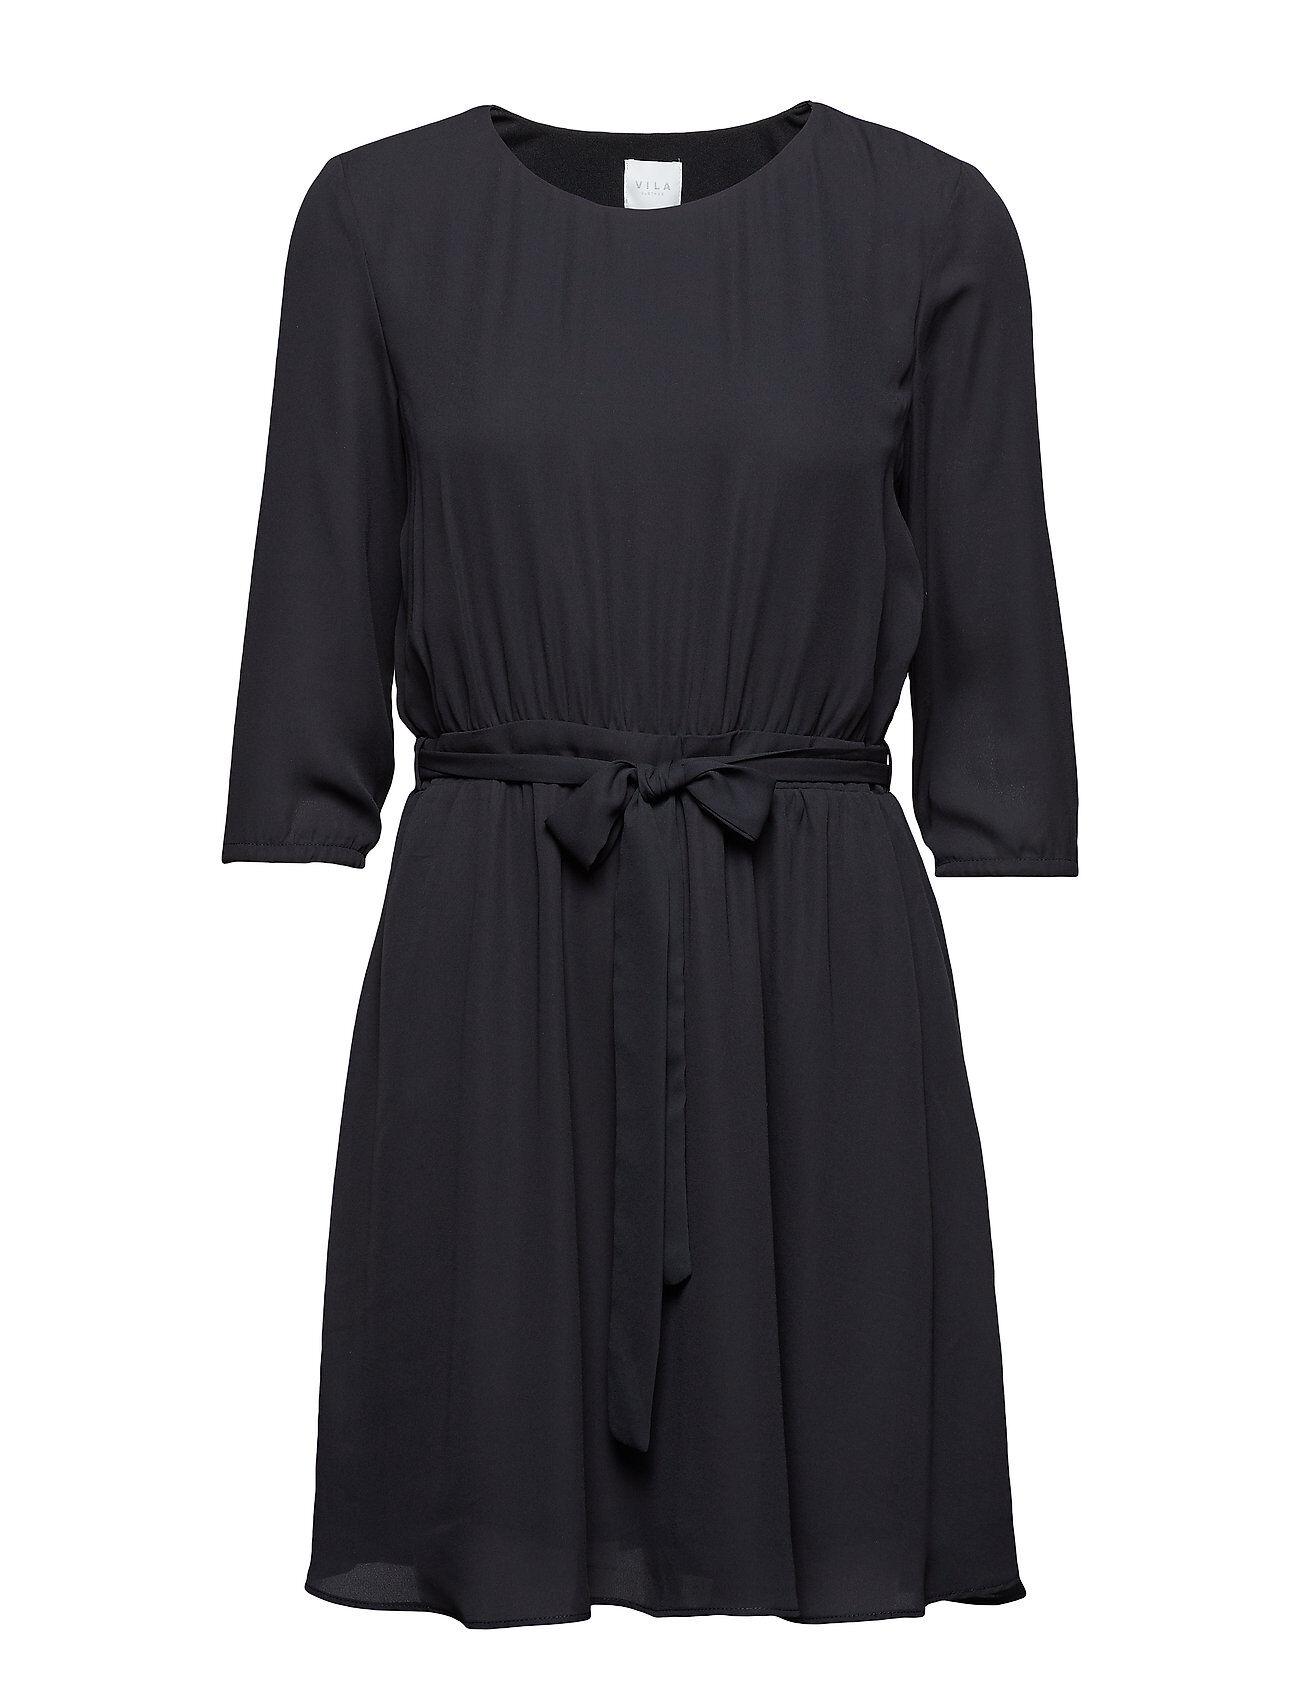 Image of VILA Vilucy 3/4 Sleeve Dress Lyhyt Mekko Musta VILA